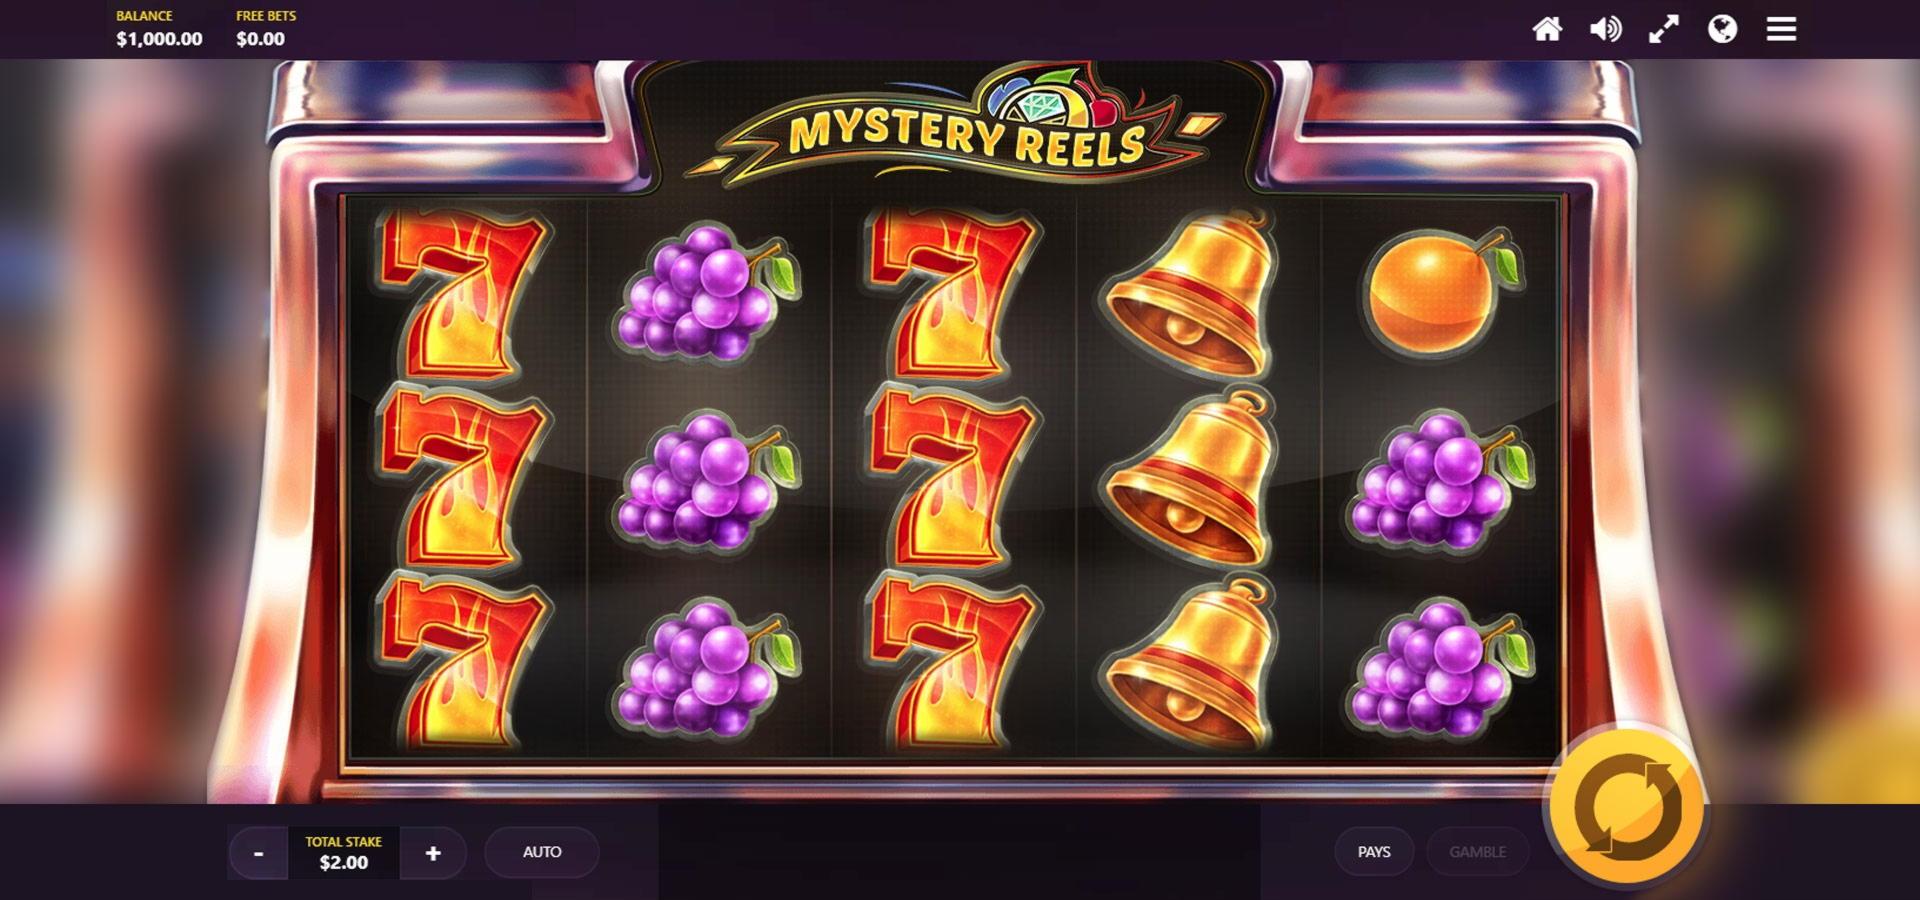 Eur 395 ԱՆՎՃԱՐ Կազինո Chip- ը `Casino On Net- ում